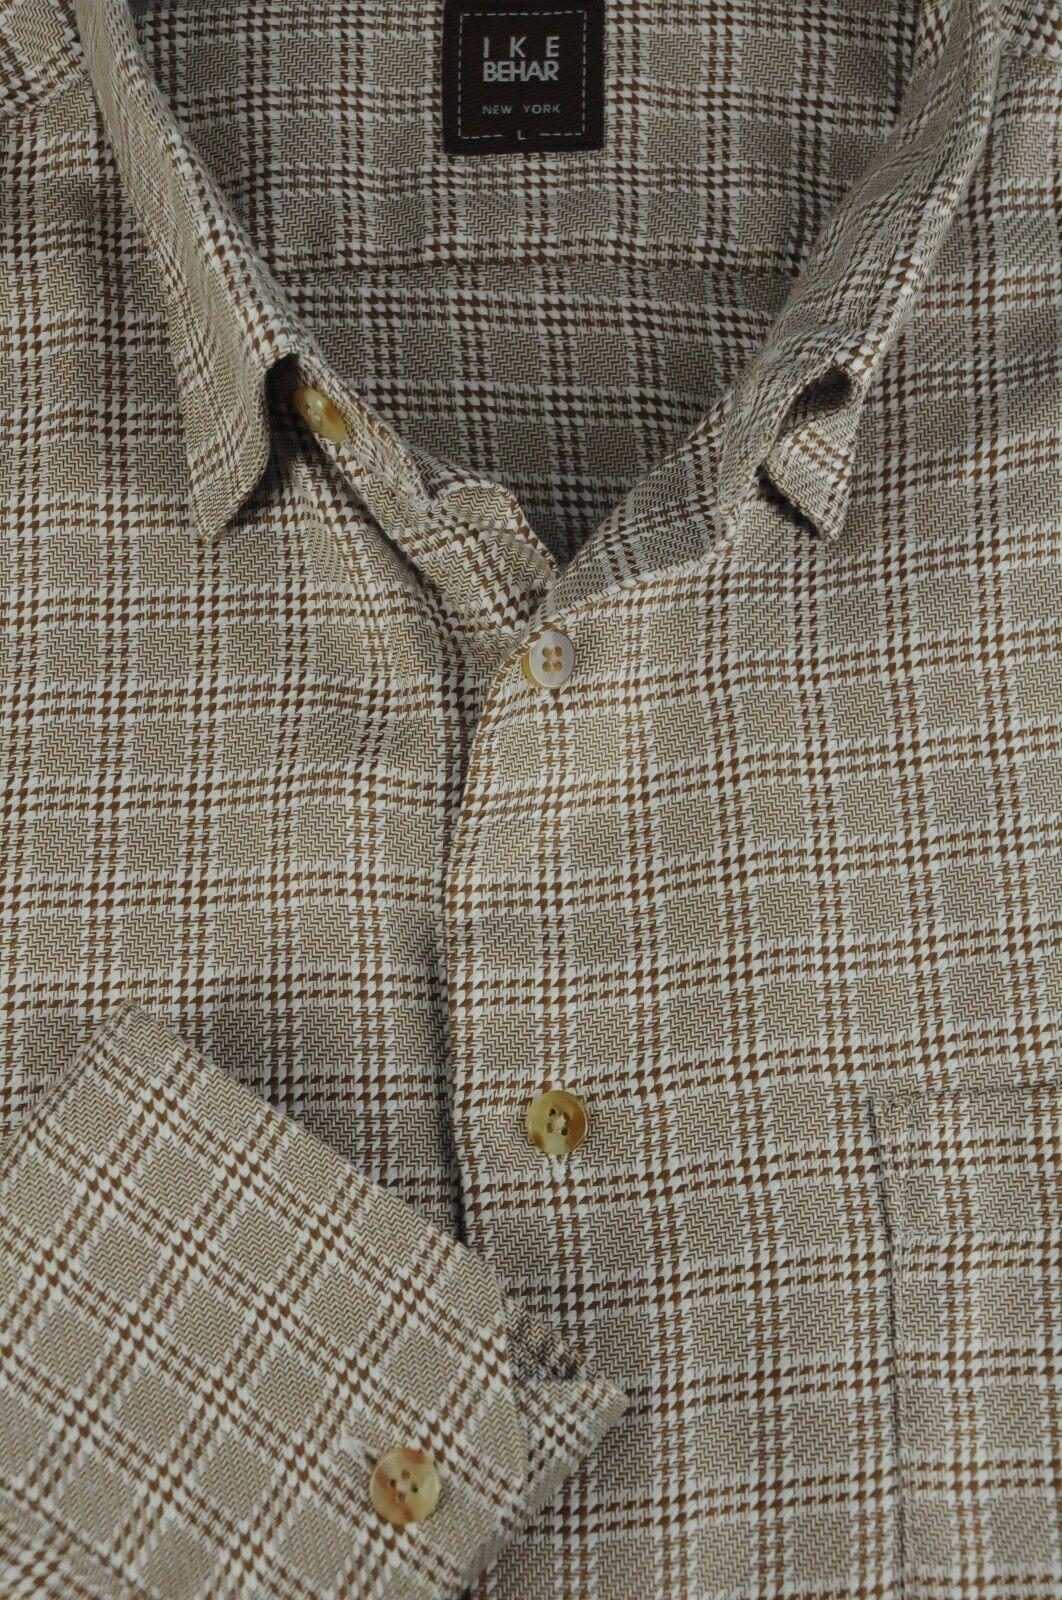 Ike Behar Men's Cafe Brown & White Geometric Cotton Casual Shirt L Large